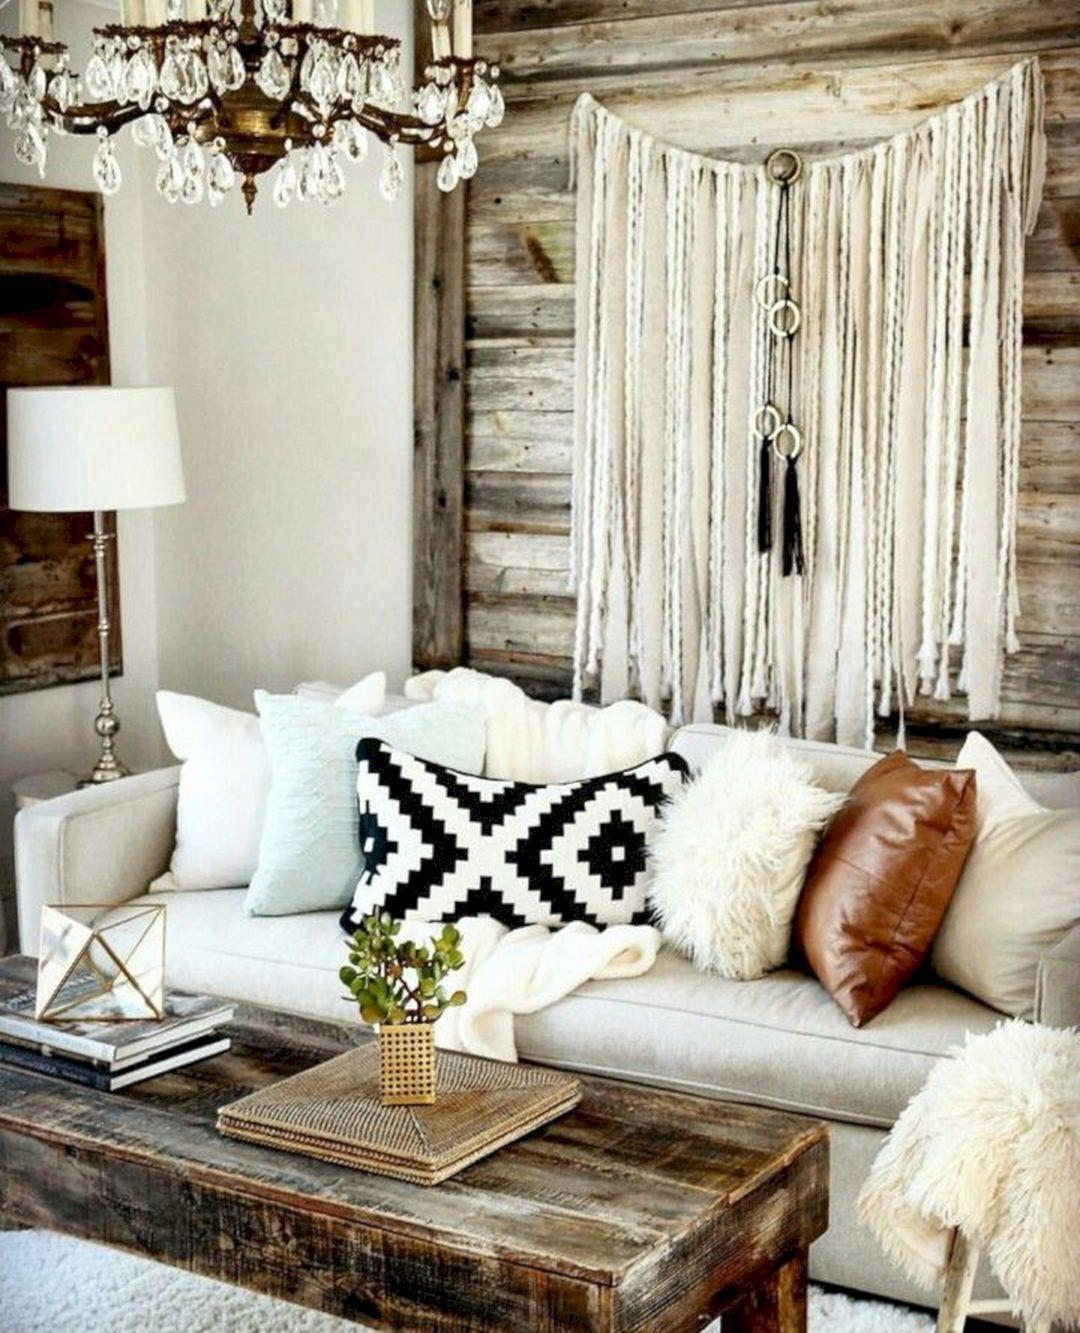 30 Beautiful Farmhemian Decorating For Perfect Home Decor Ideas